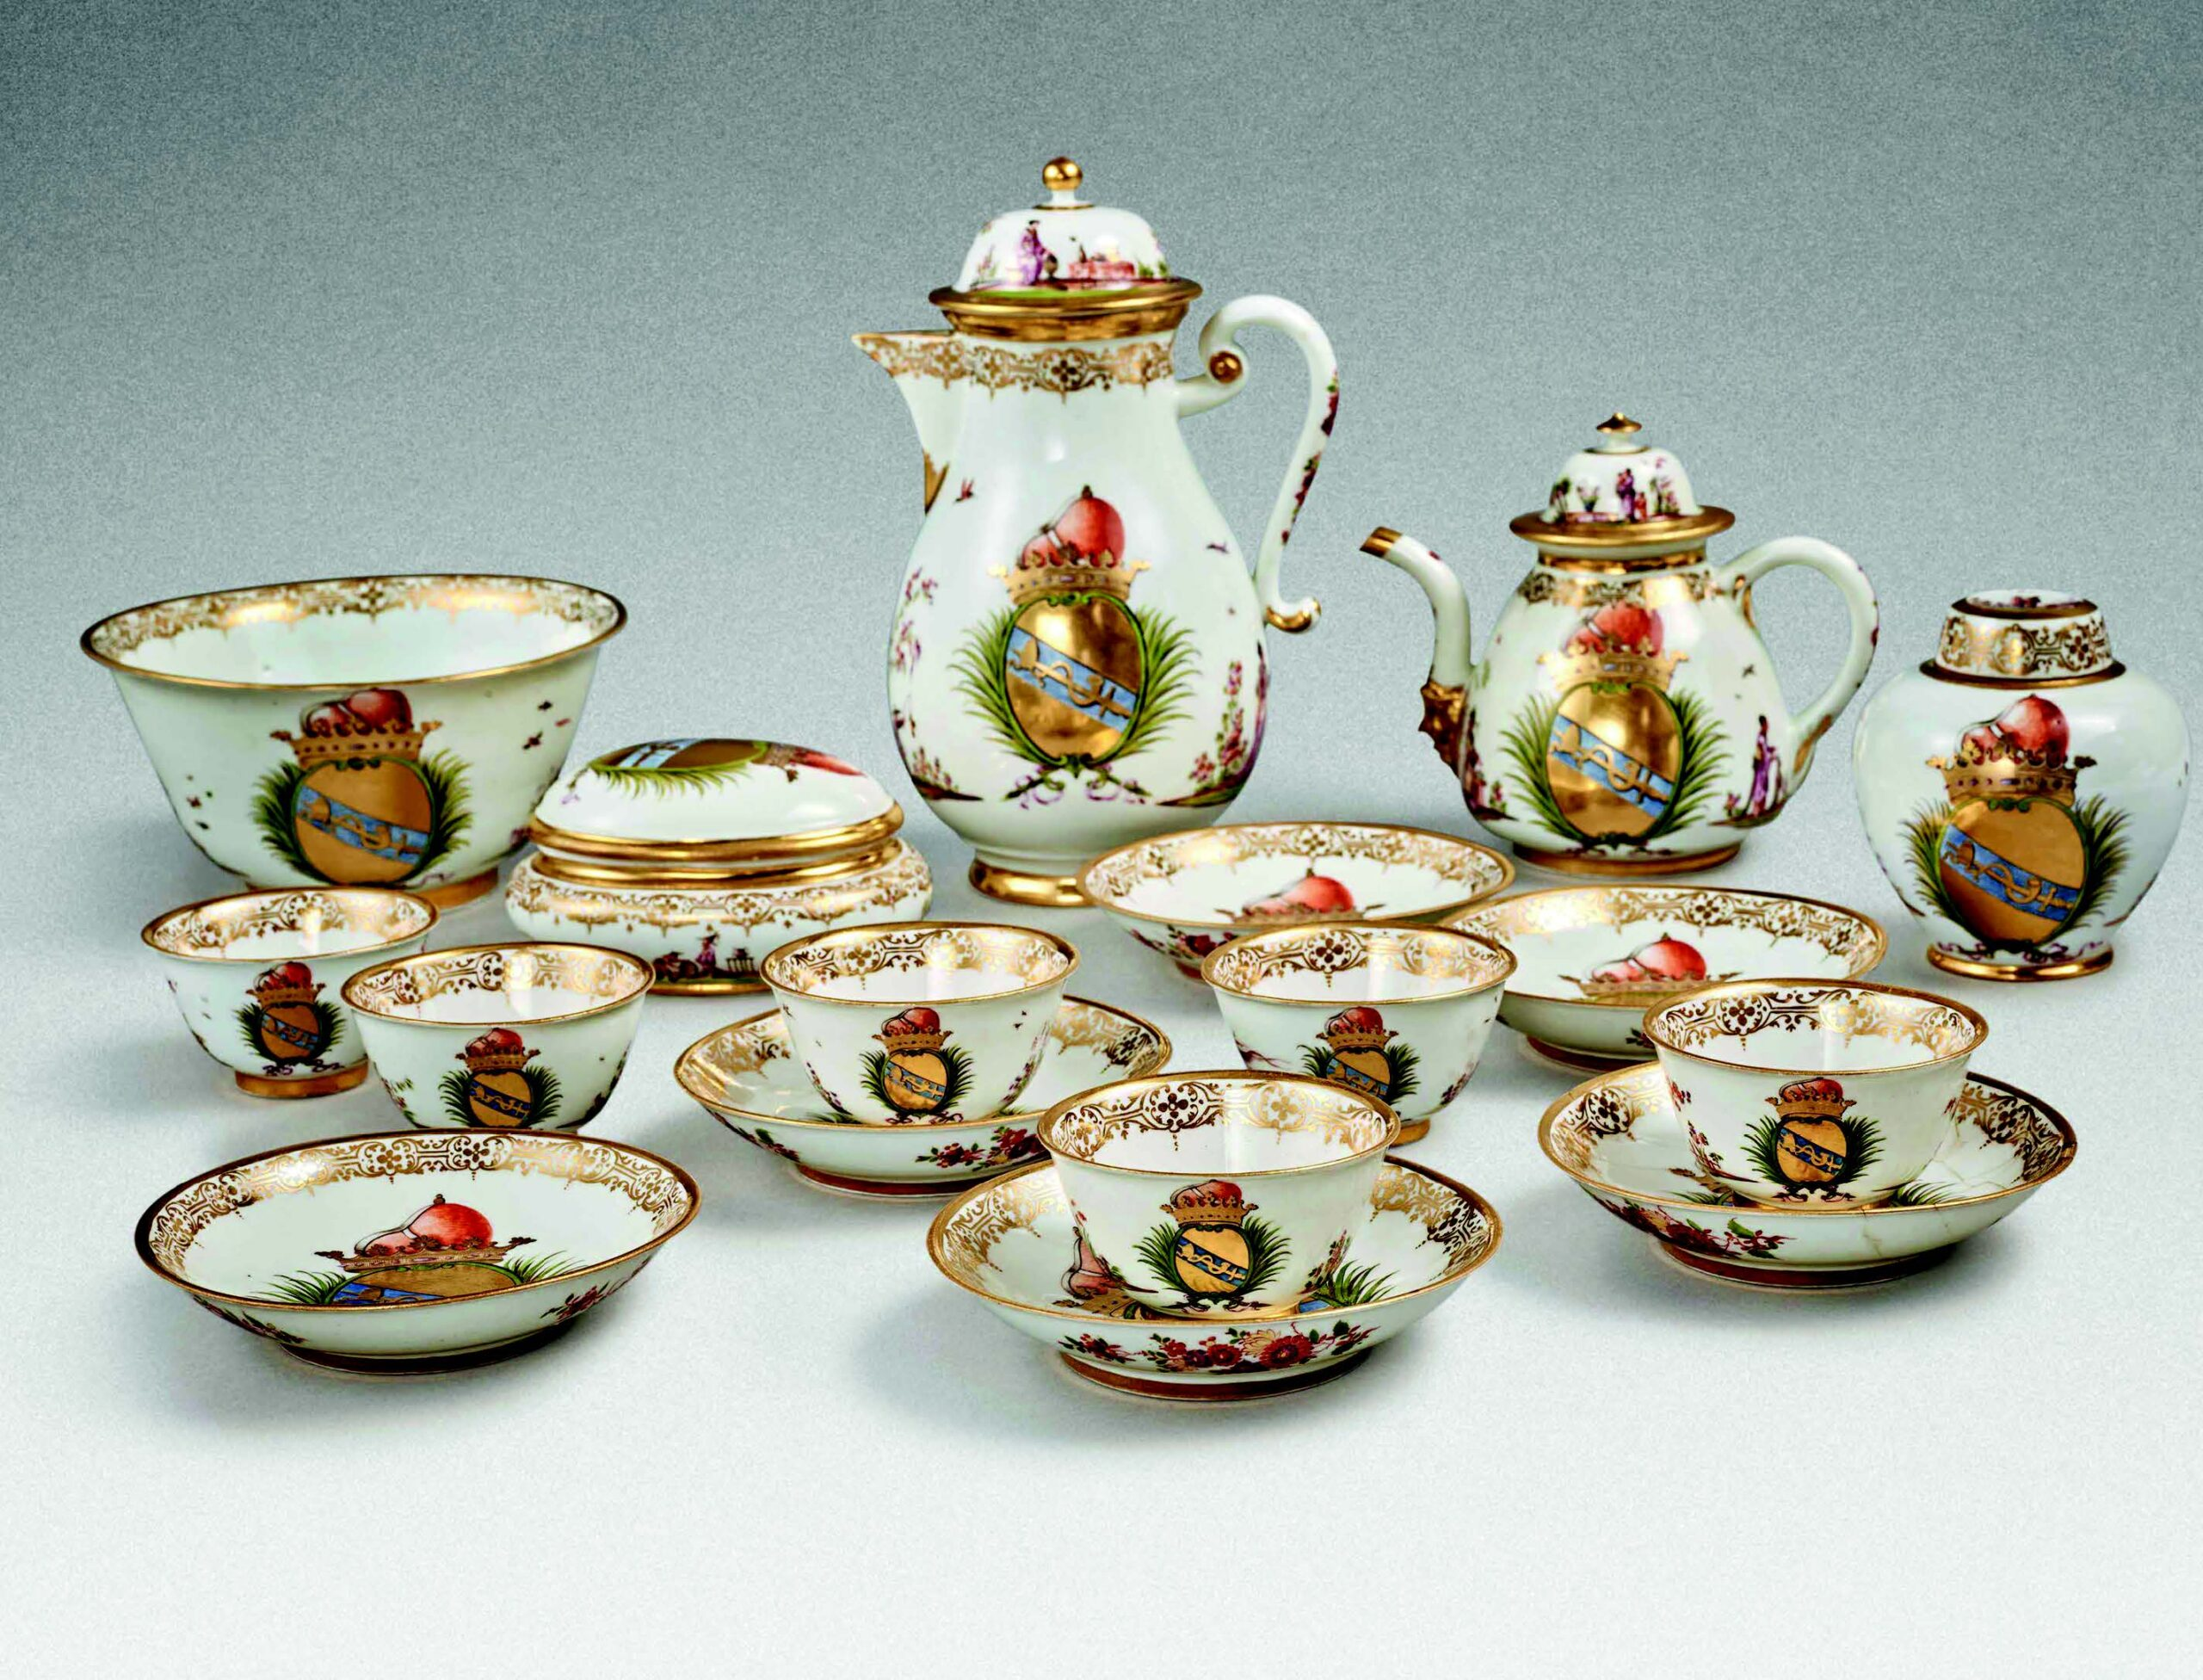 Meissen porcelain once stolen by theNazis